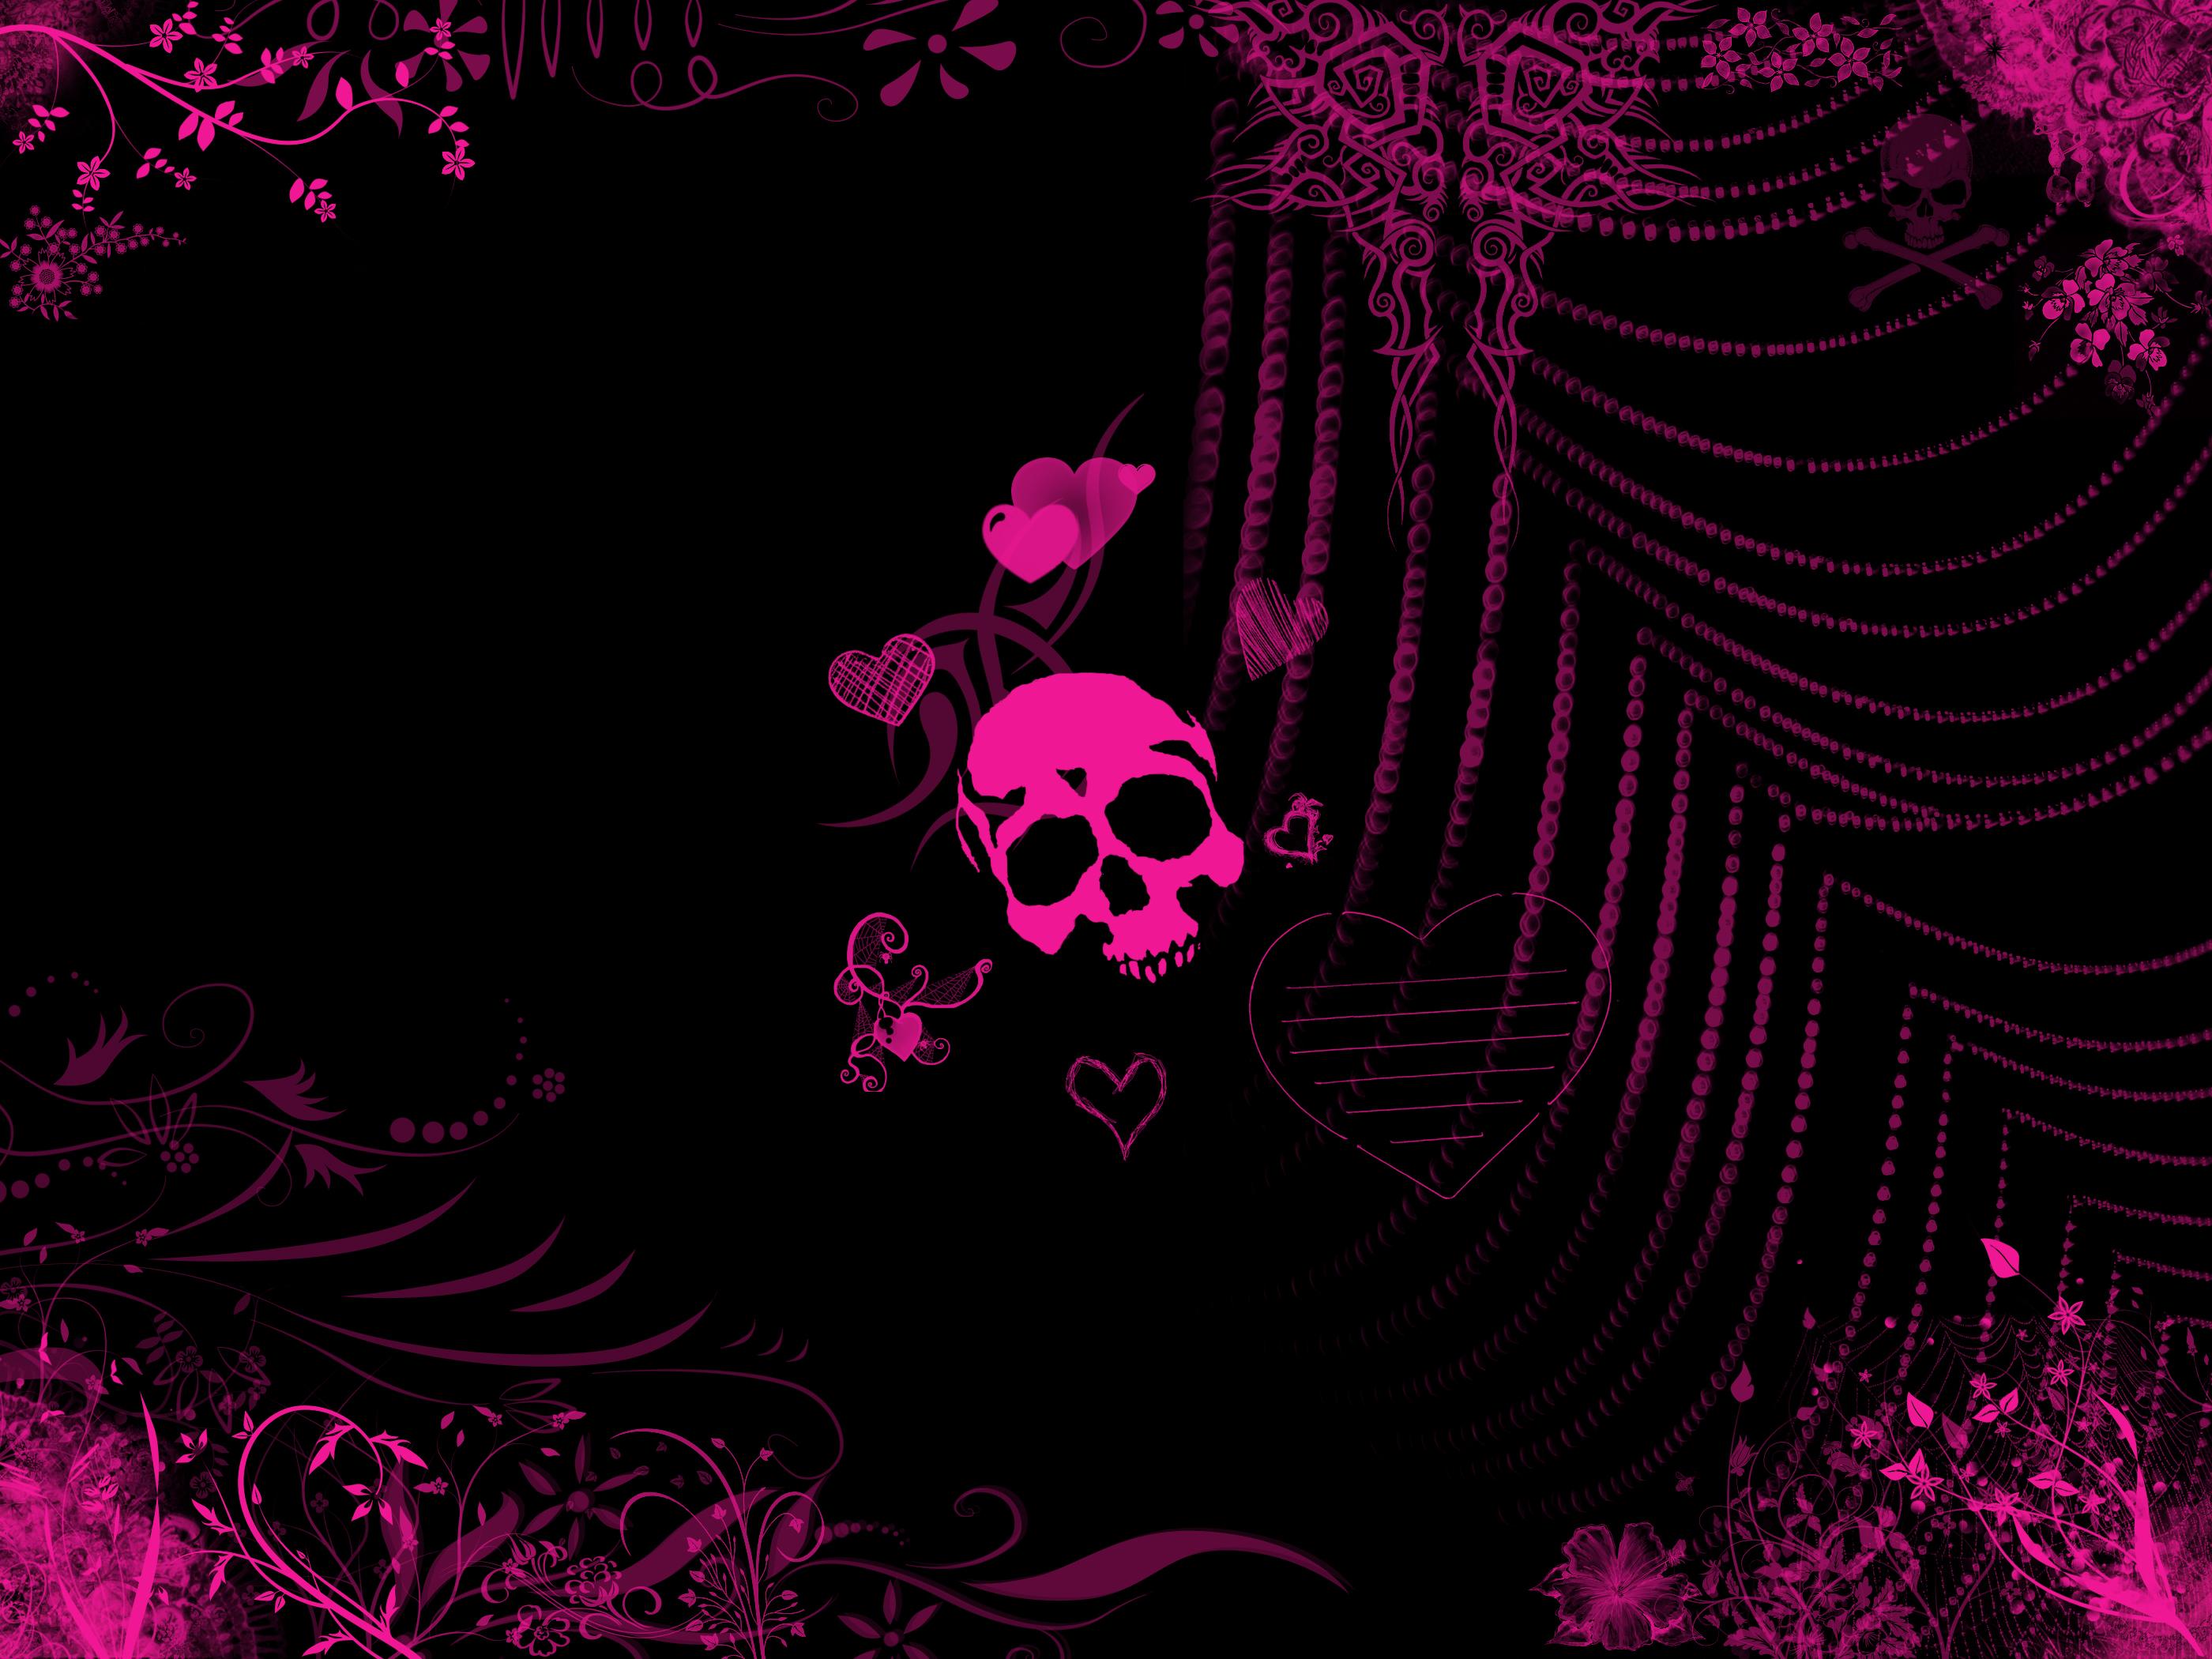 Girly Skull Wallpaper Related wallpaper for pink emo 2800x2100